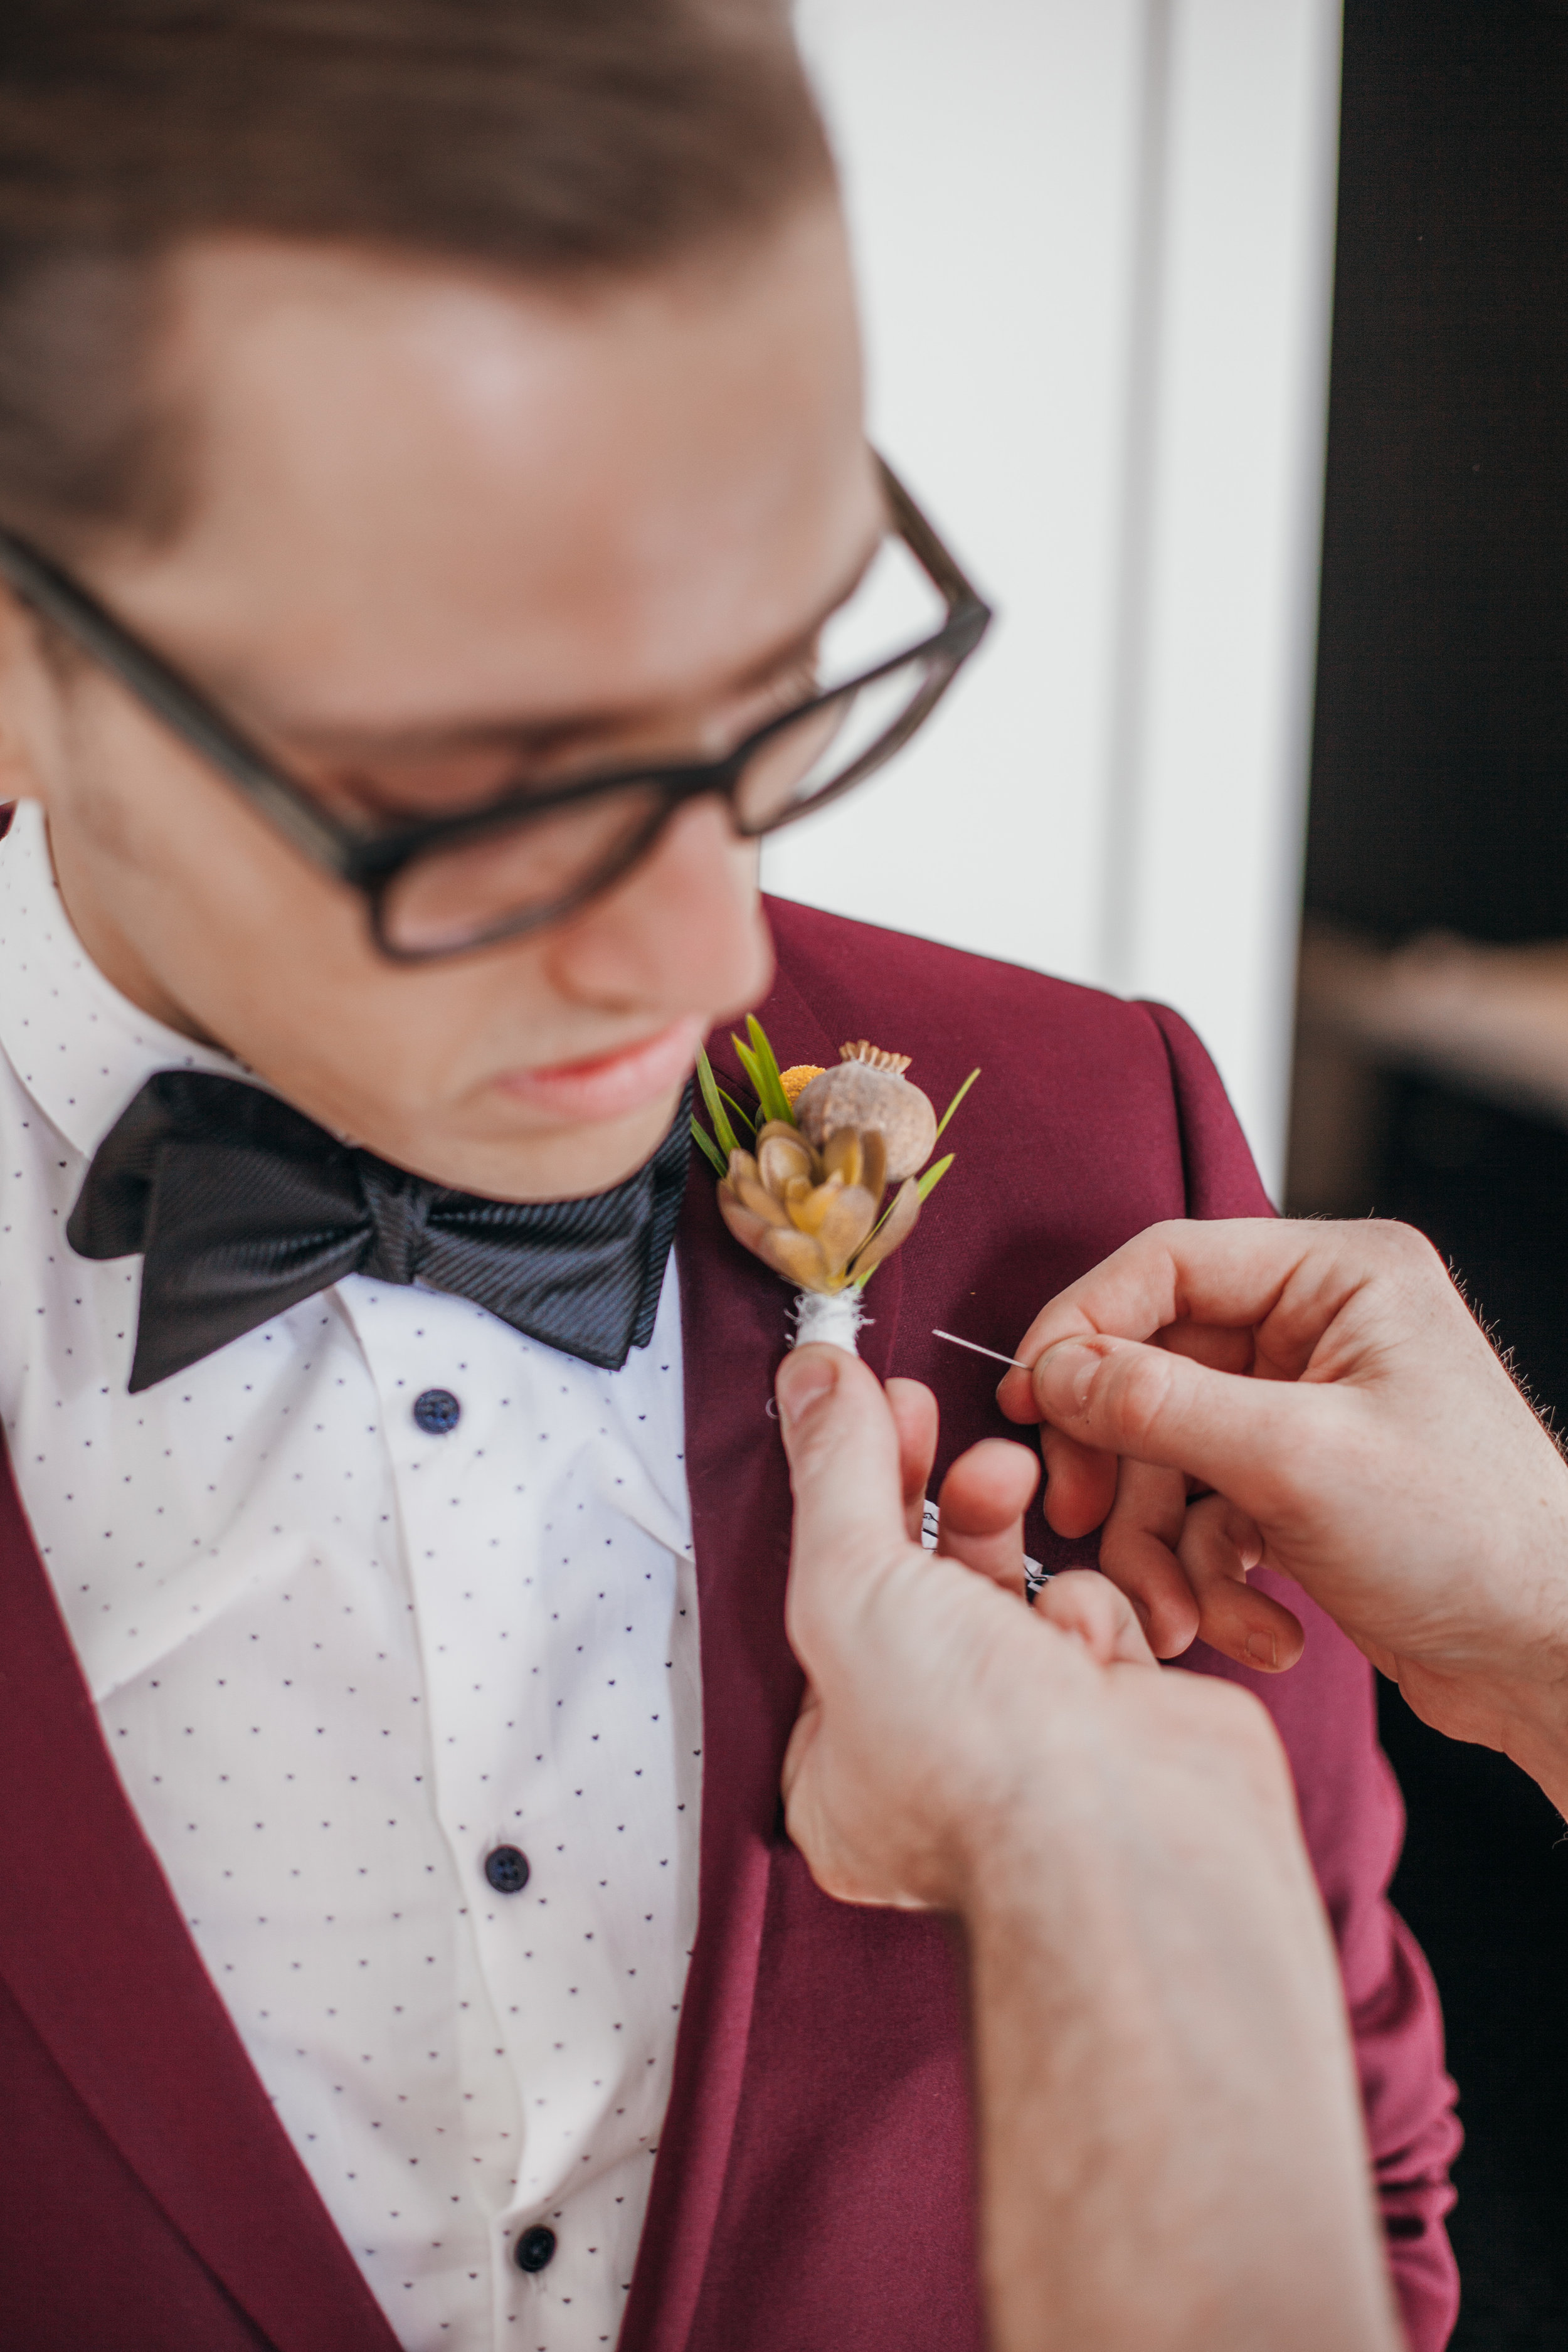 julia-hembree-photography-eden-village-church-wedding-savannah-warehouse-wedding-ivory-and-beau-bridal-boutique-savannah-florist-savannah-wedding-planner-savannah-event-design-scad-wedding-artist-wedding-savannah-funky-wedding-handmade-wedding-17.jpg